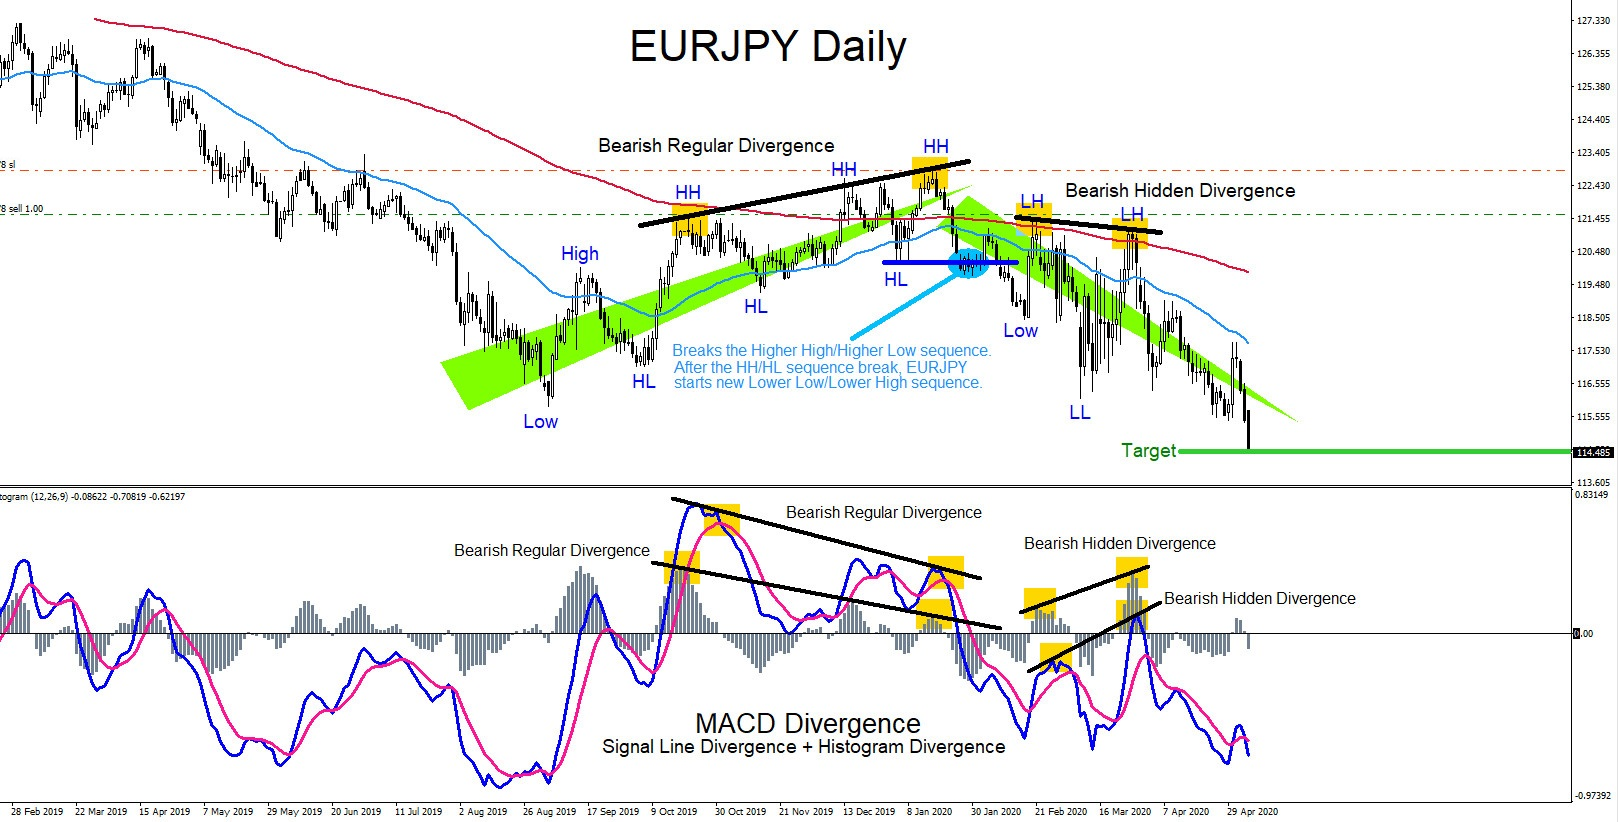 EURJPY, elliottwave, trading, market pattern, divergence, AidanFX, technical analysis, forex